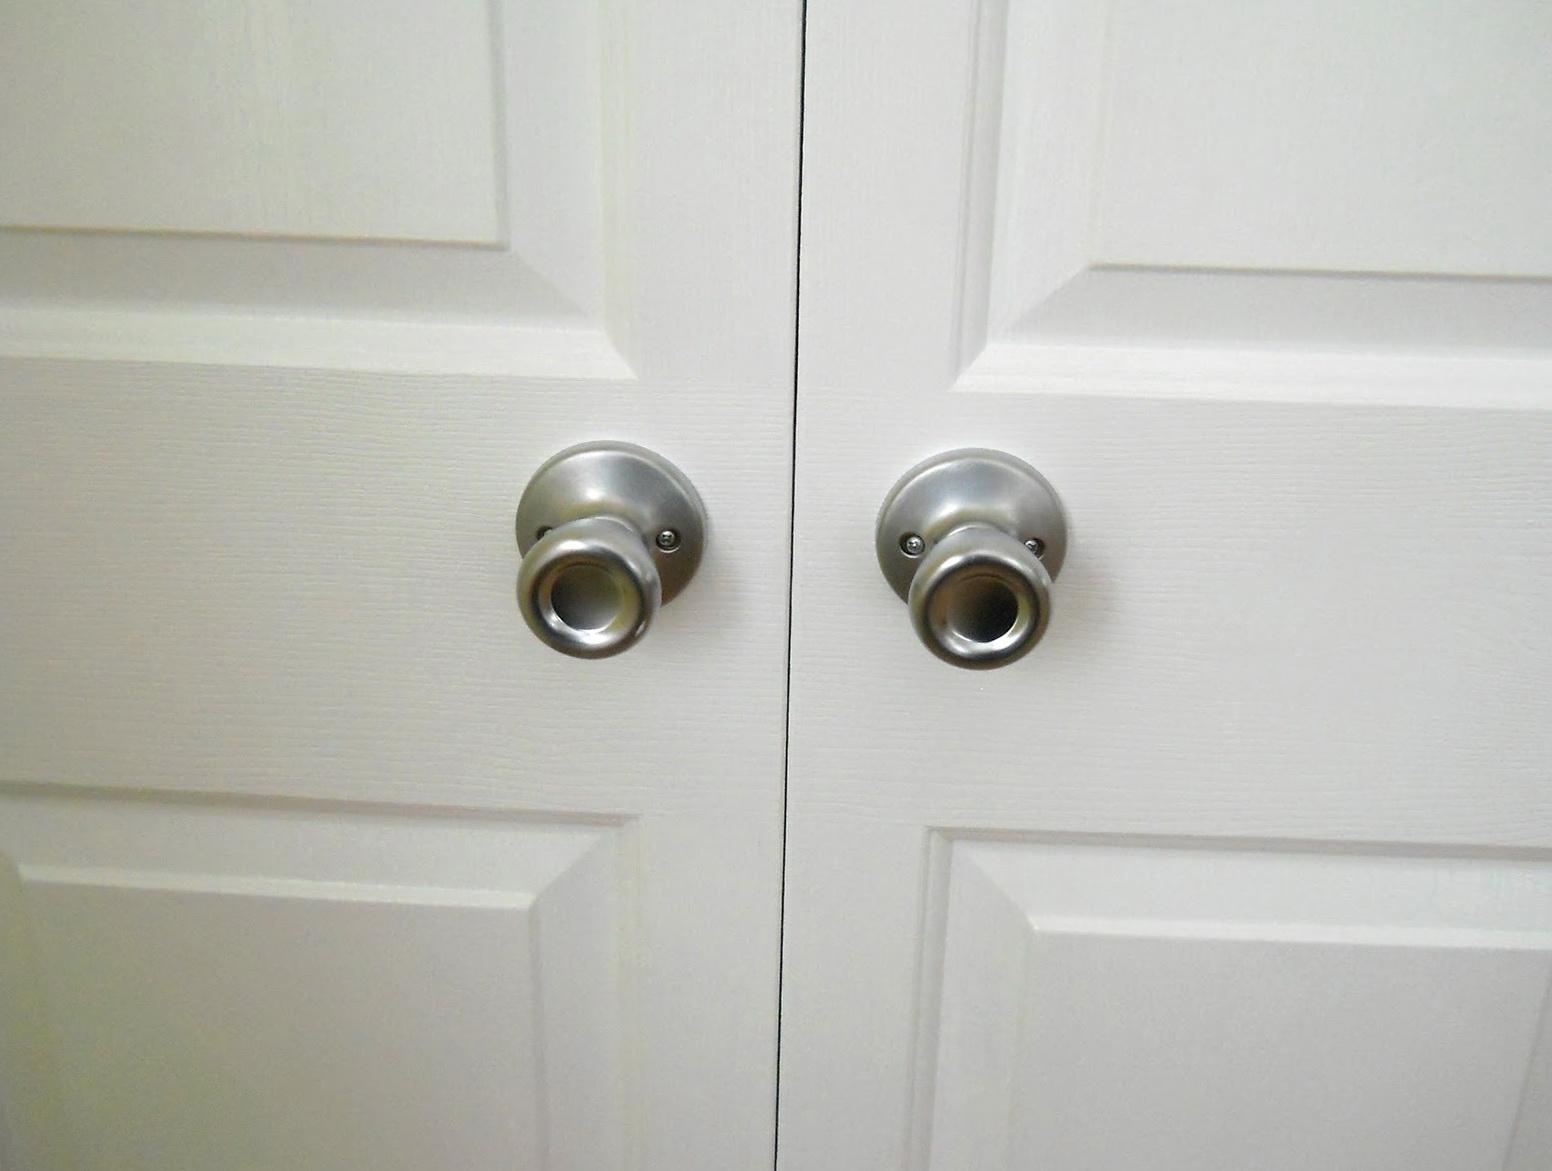 Where To To Bifold Closet Doors Knobs